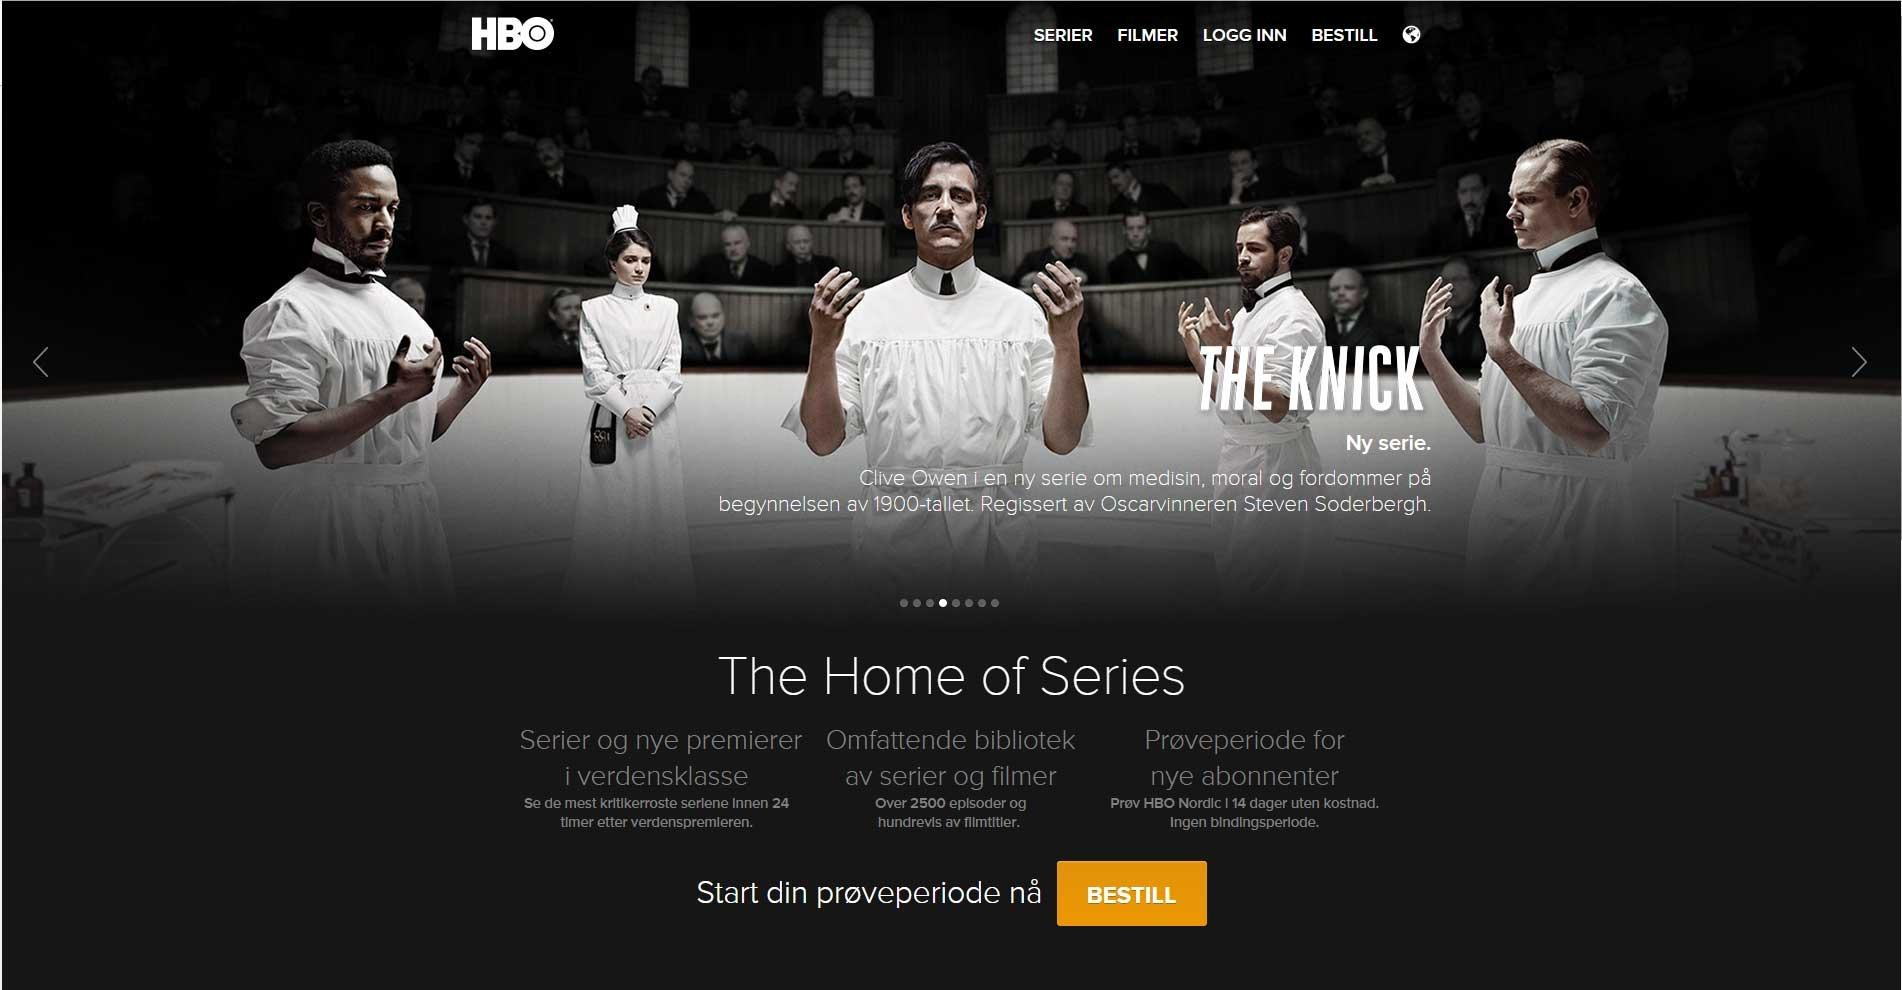 HBO, skjermdump 7.10.2014.